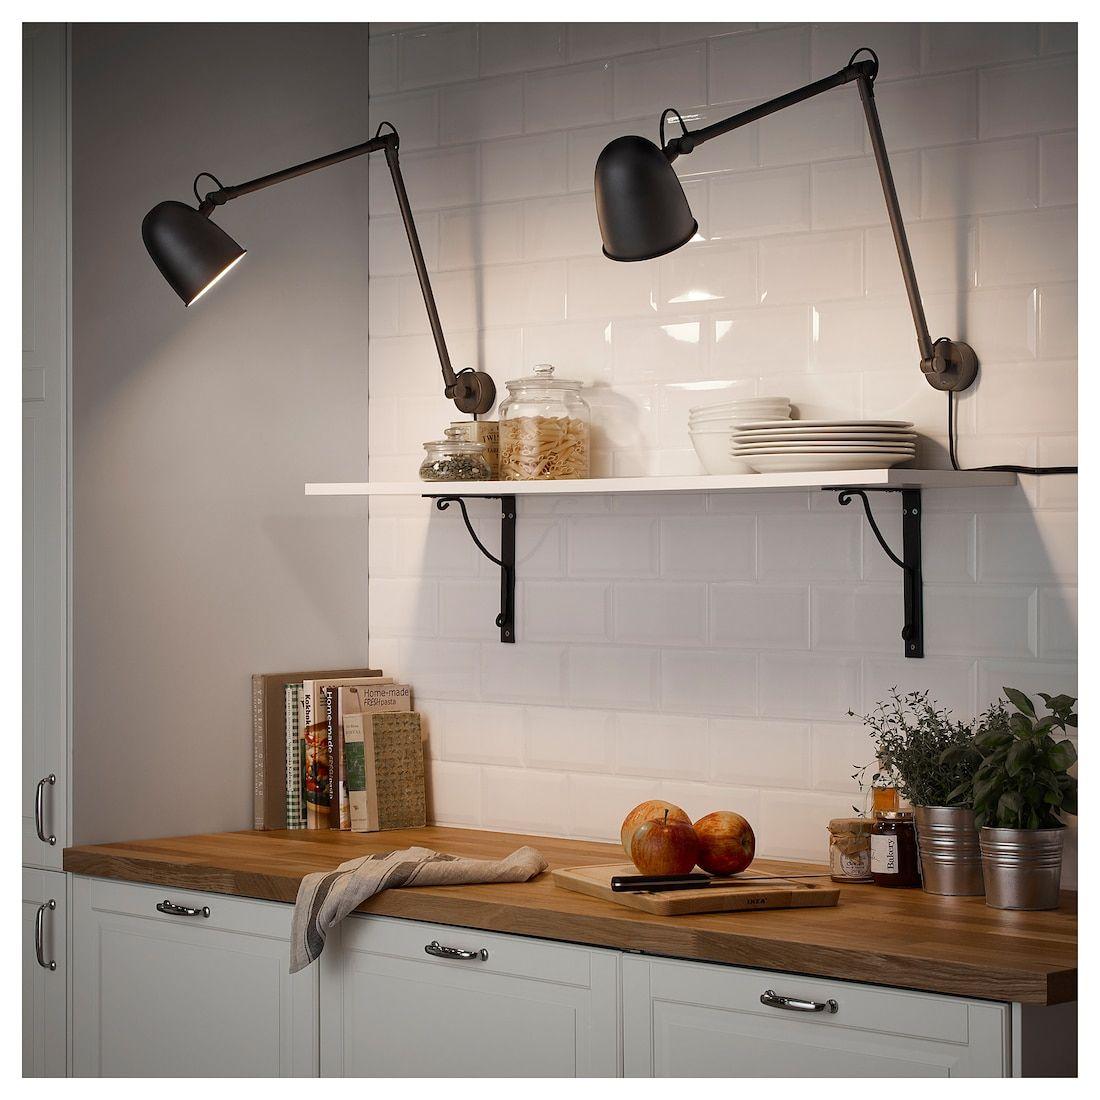 Skurup Arbejds Vaeglampe Sort Ikea Wandleuchte Wandleuchte Schwarz Ikea Deckenlampe